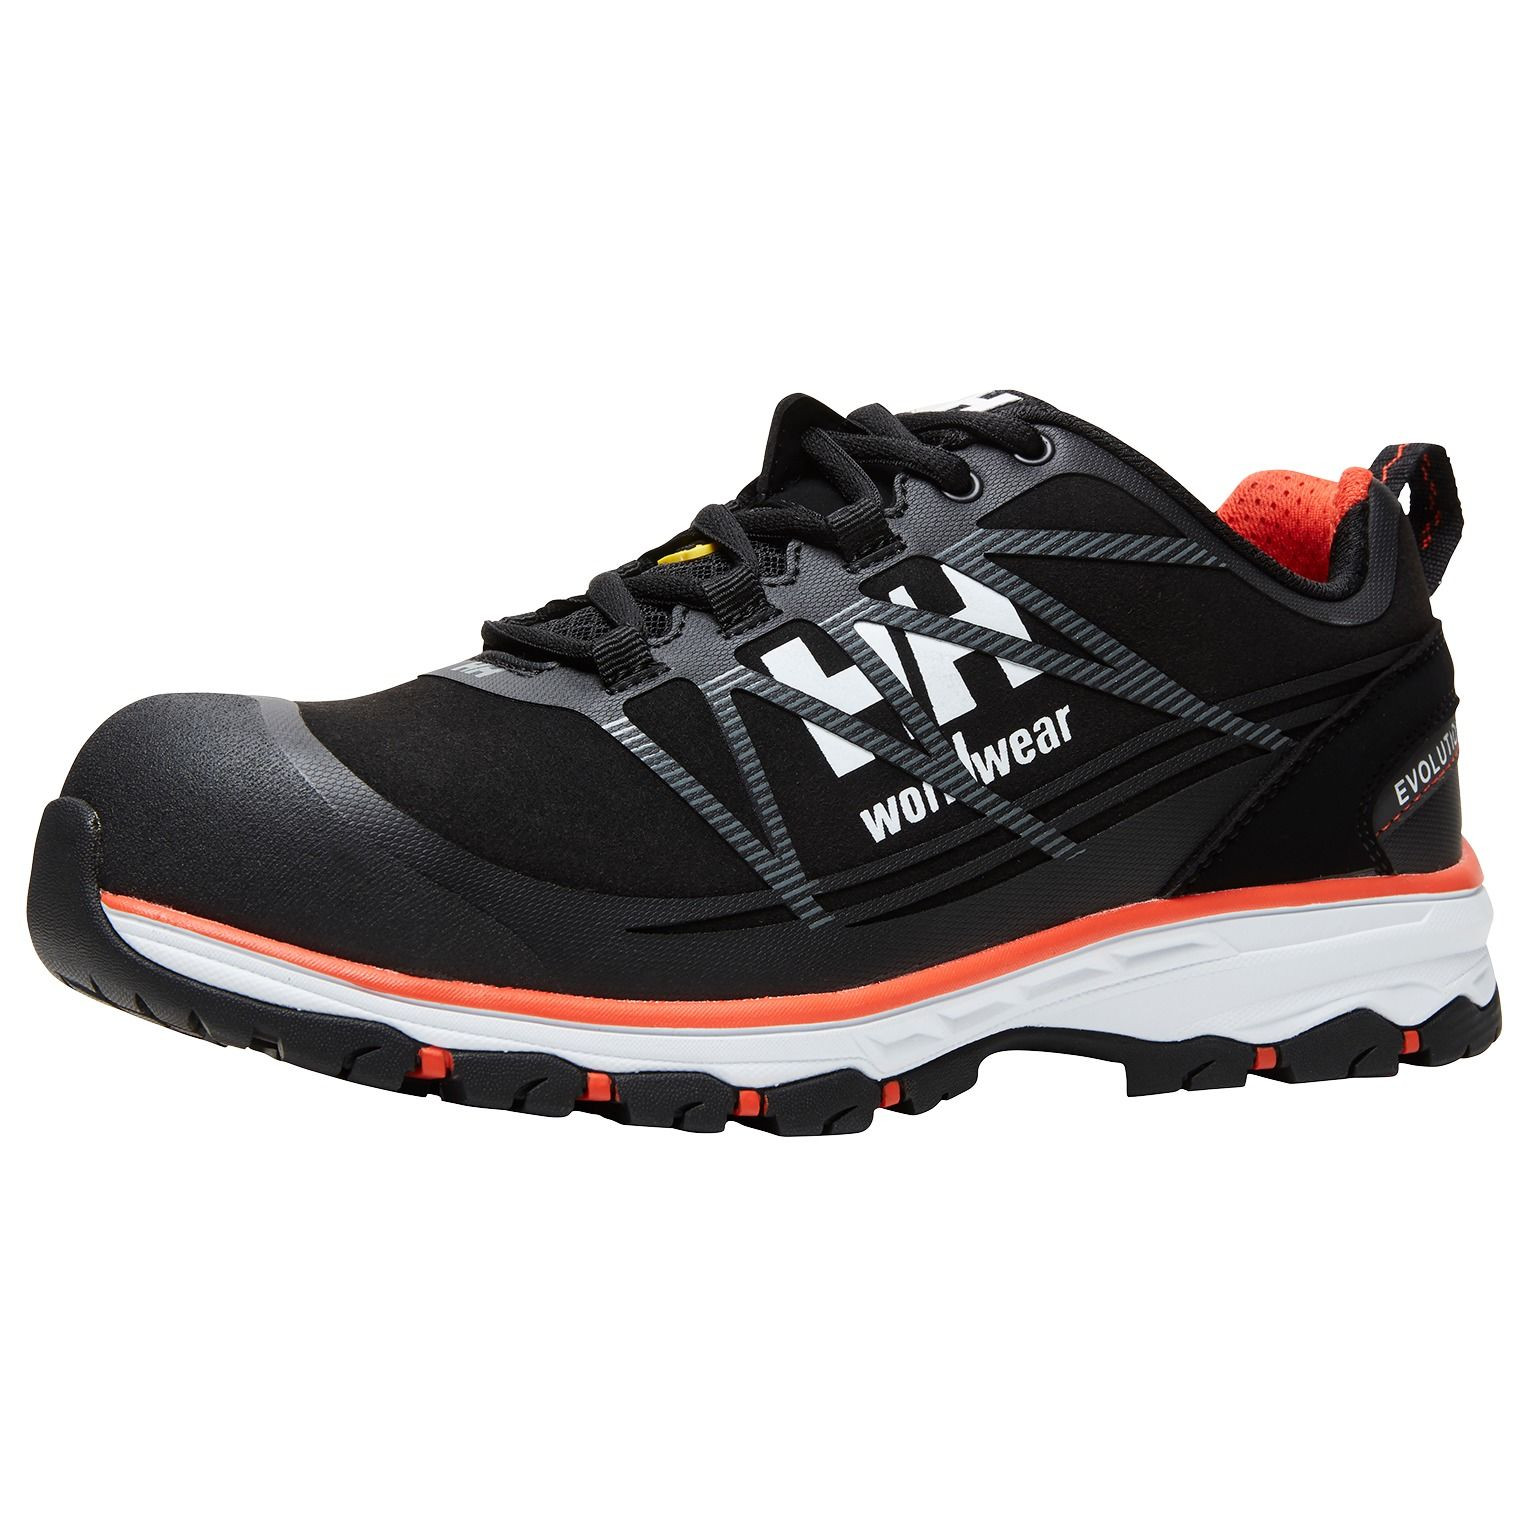 Демисезонные ботинки Helly Hansen Chelsea Evolution Low - 78224 (Black / Orange; 42)